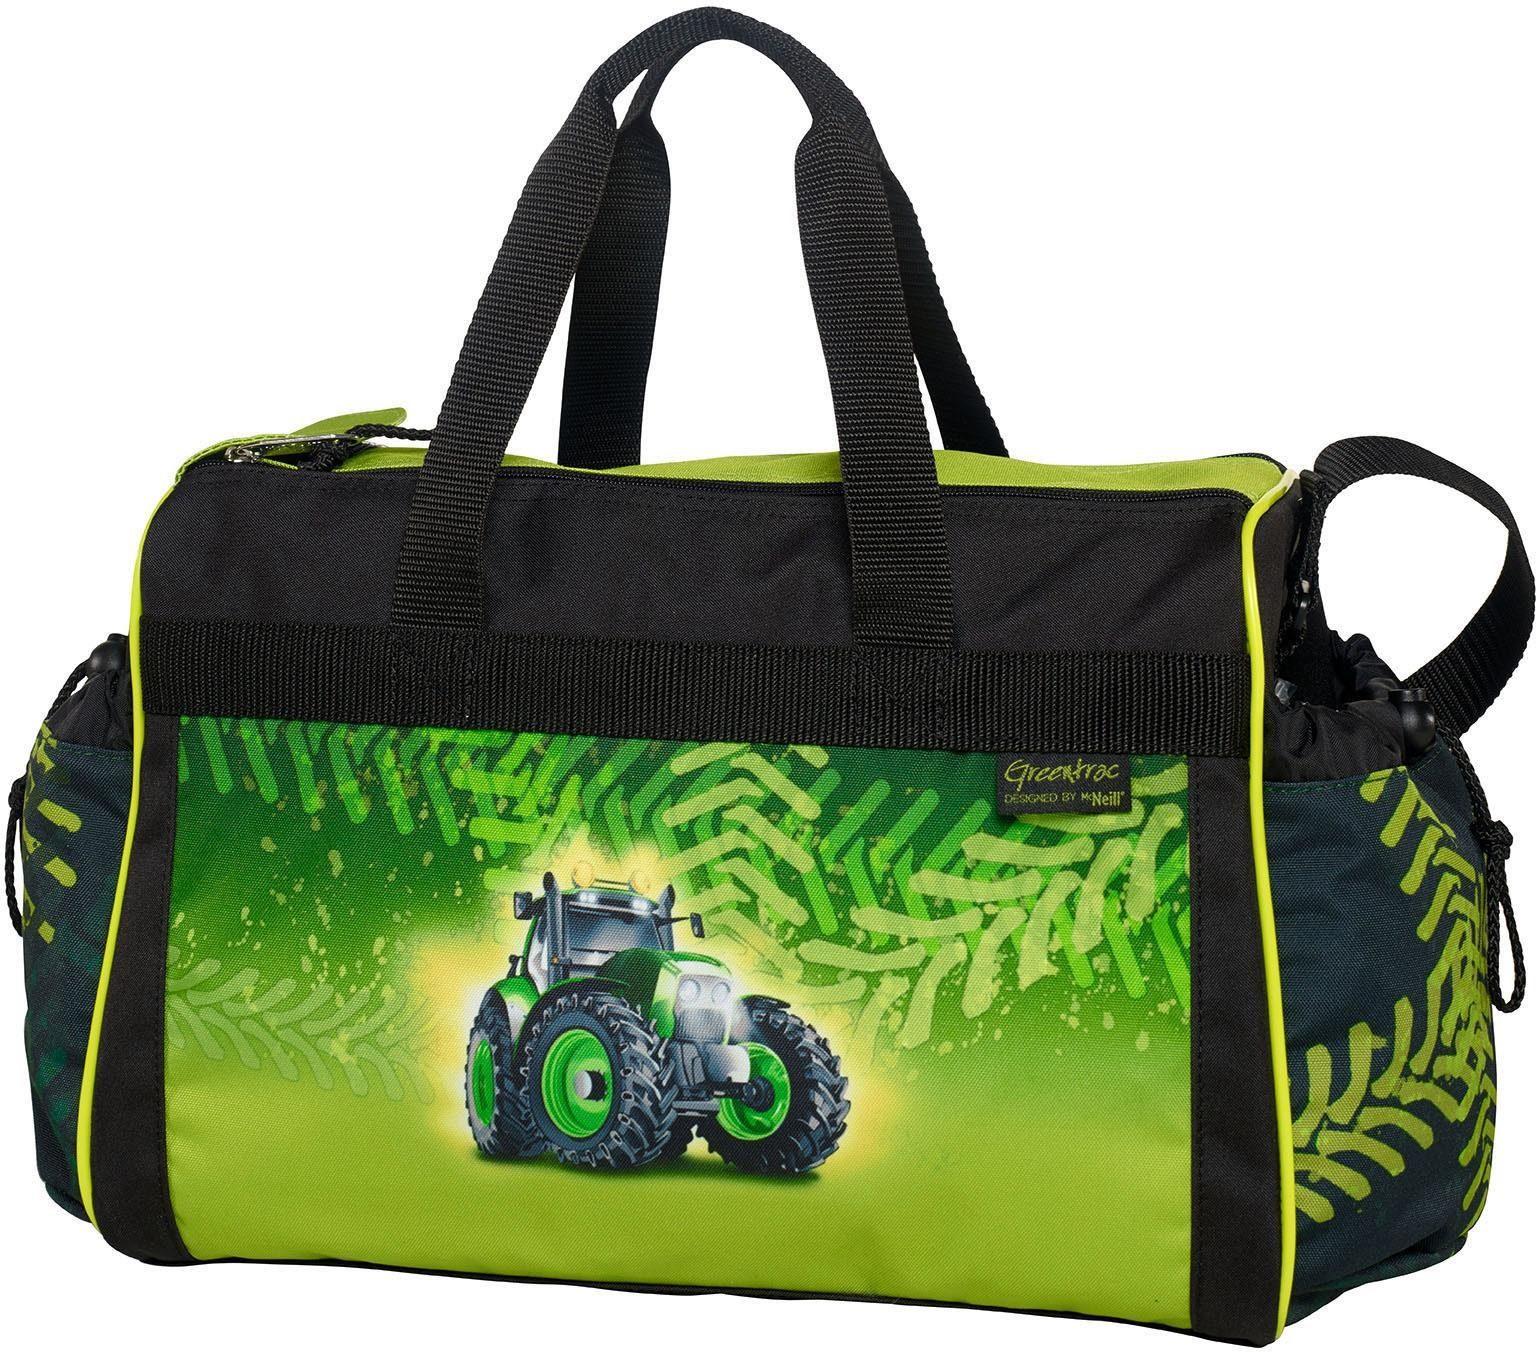 McNeill Sporttasche, »Greentrac«